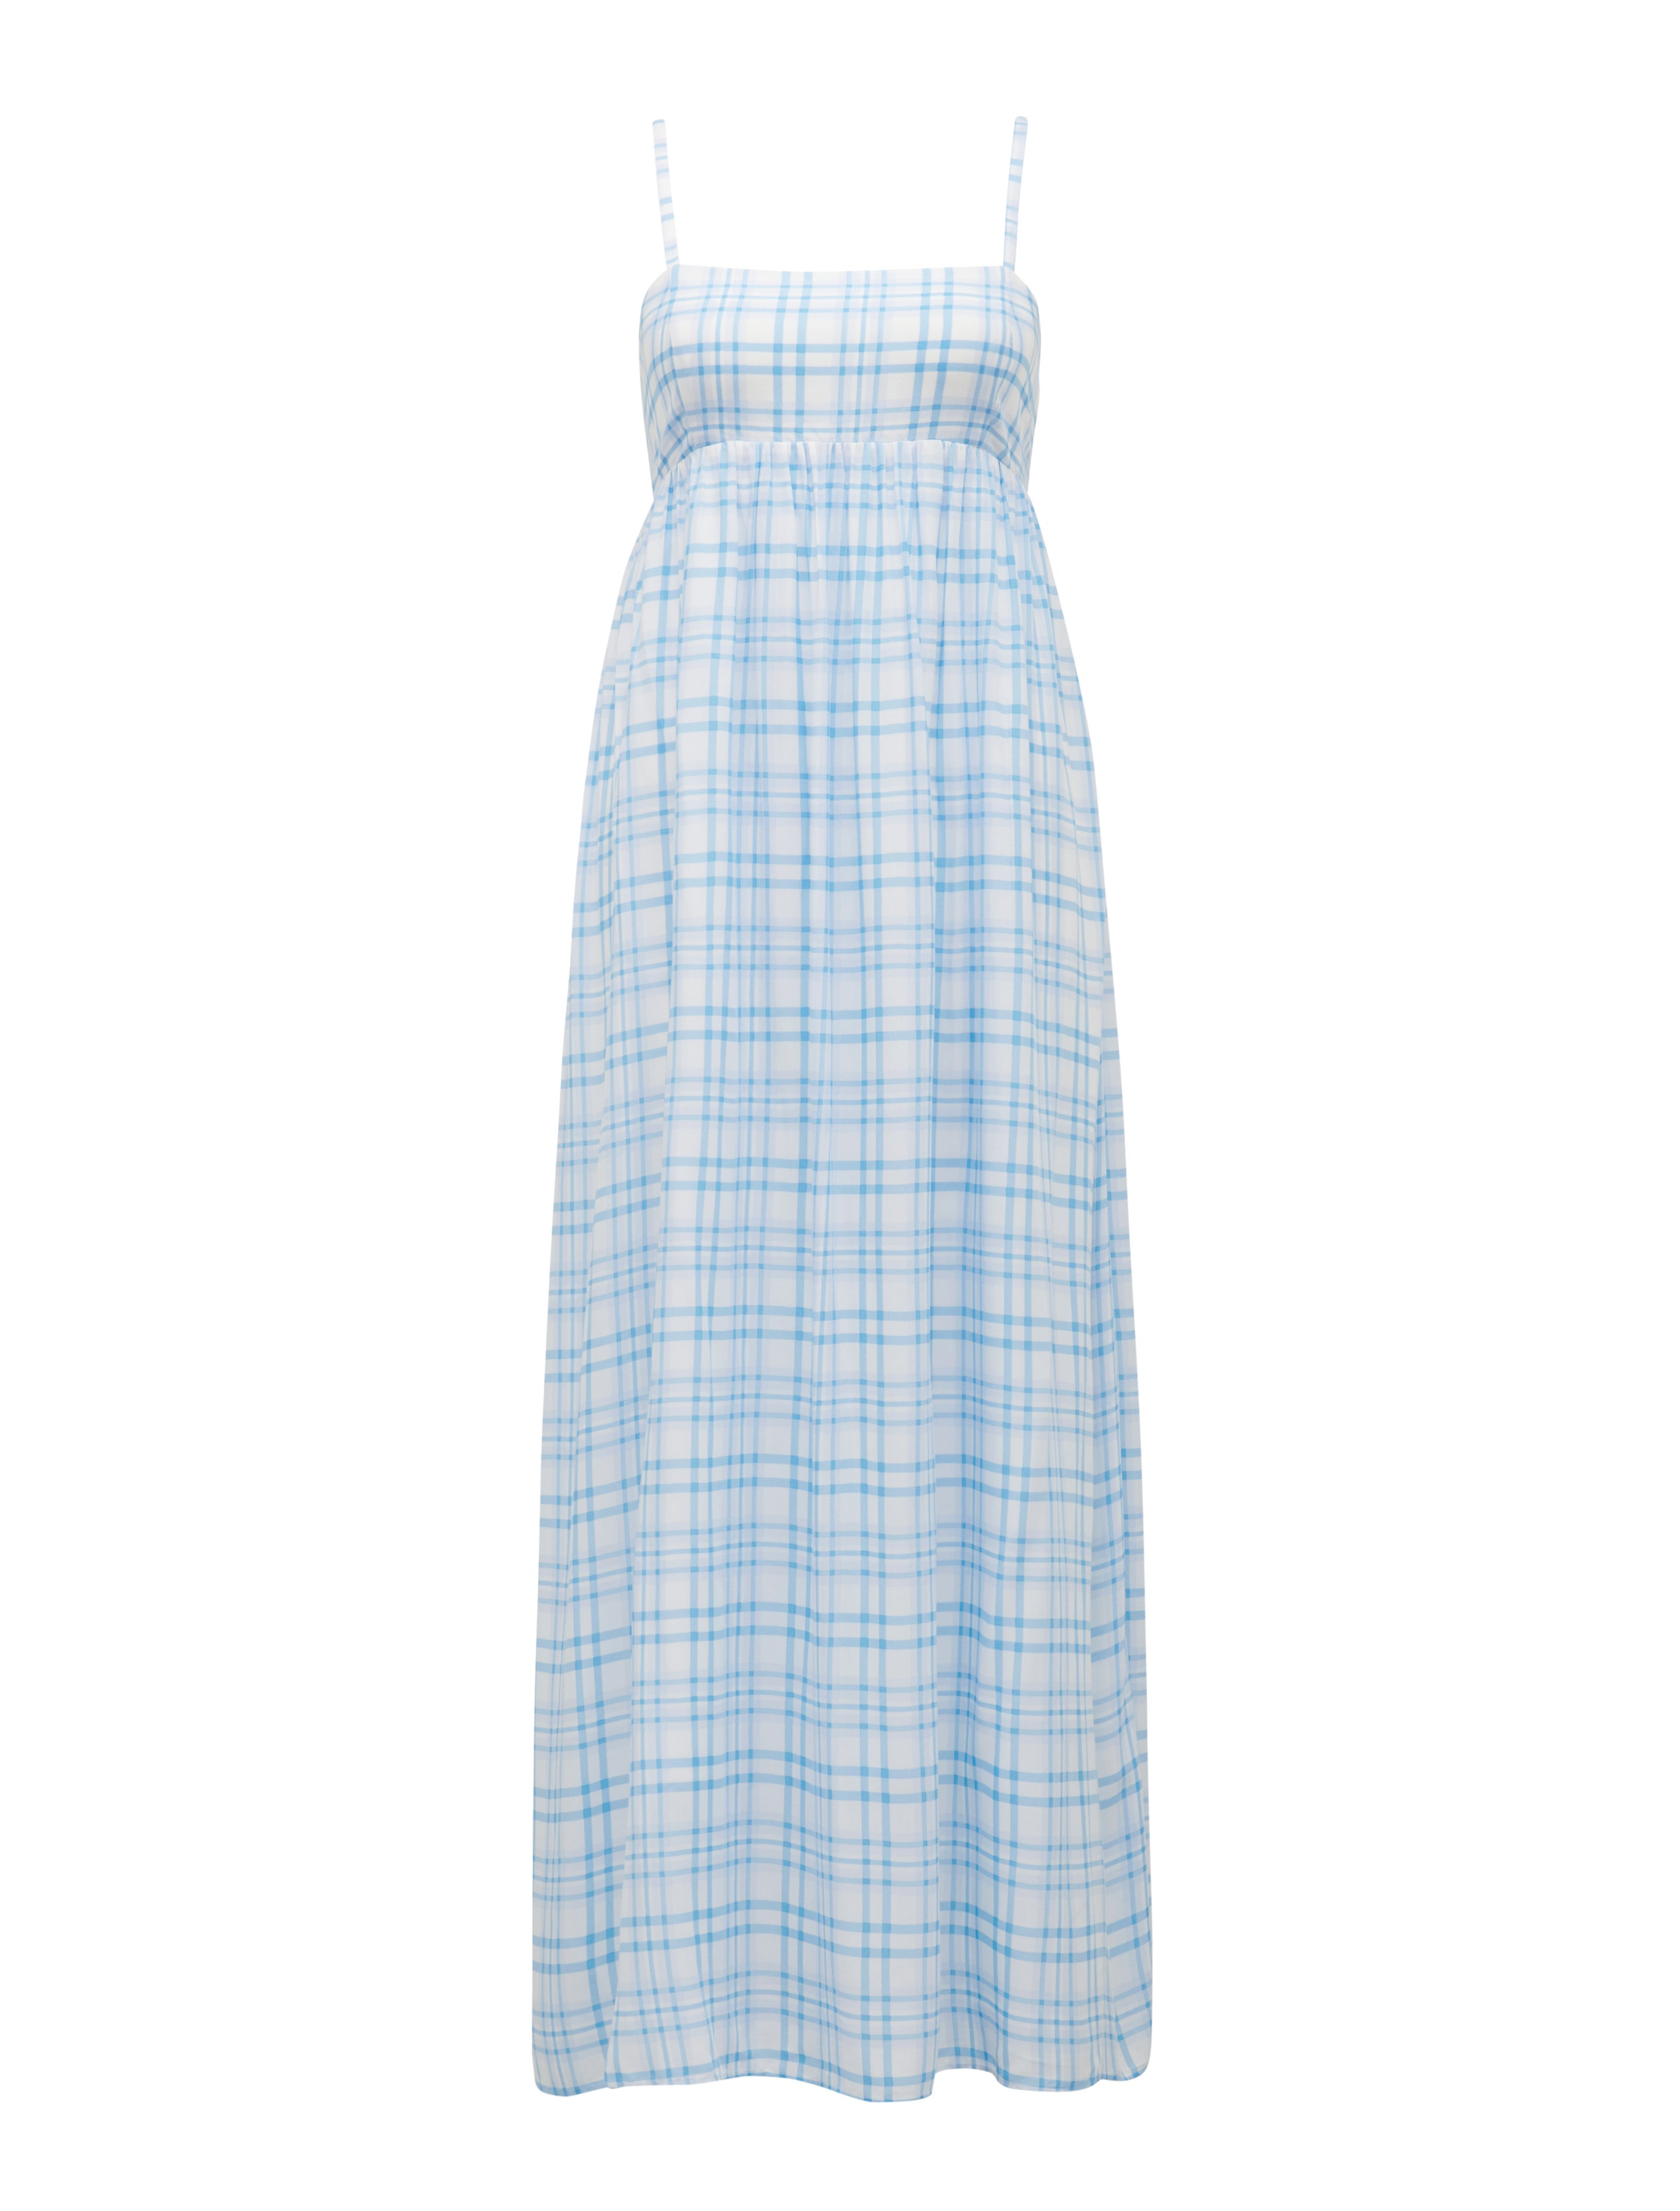 Maisie House Dress